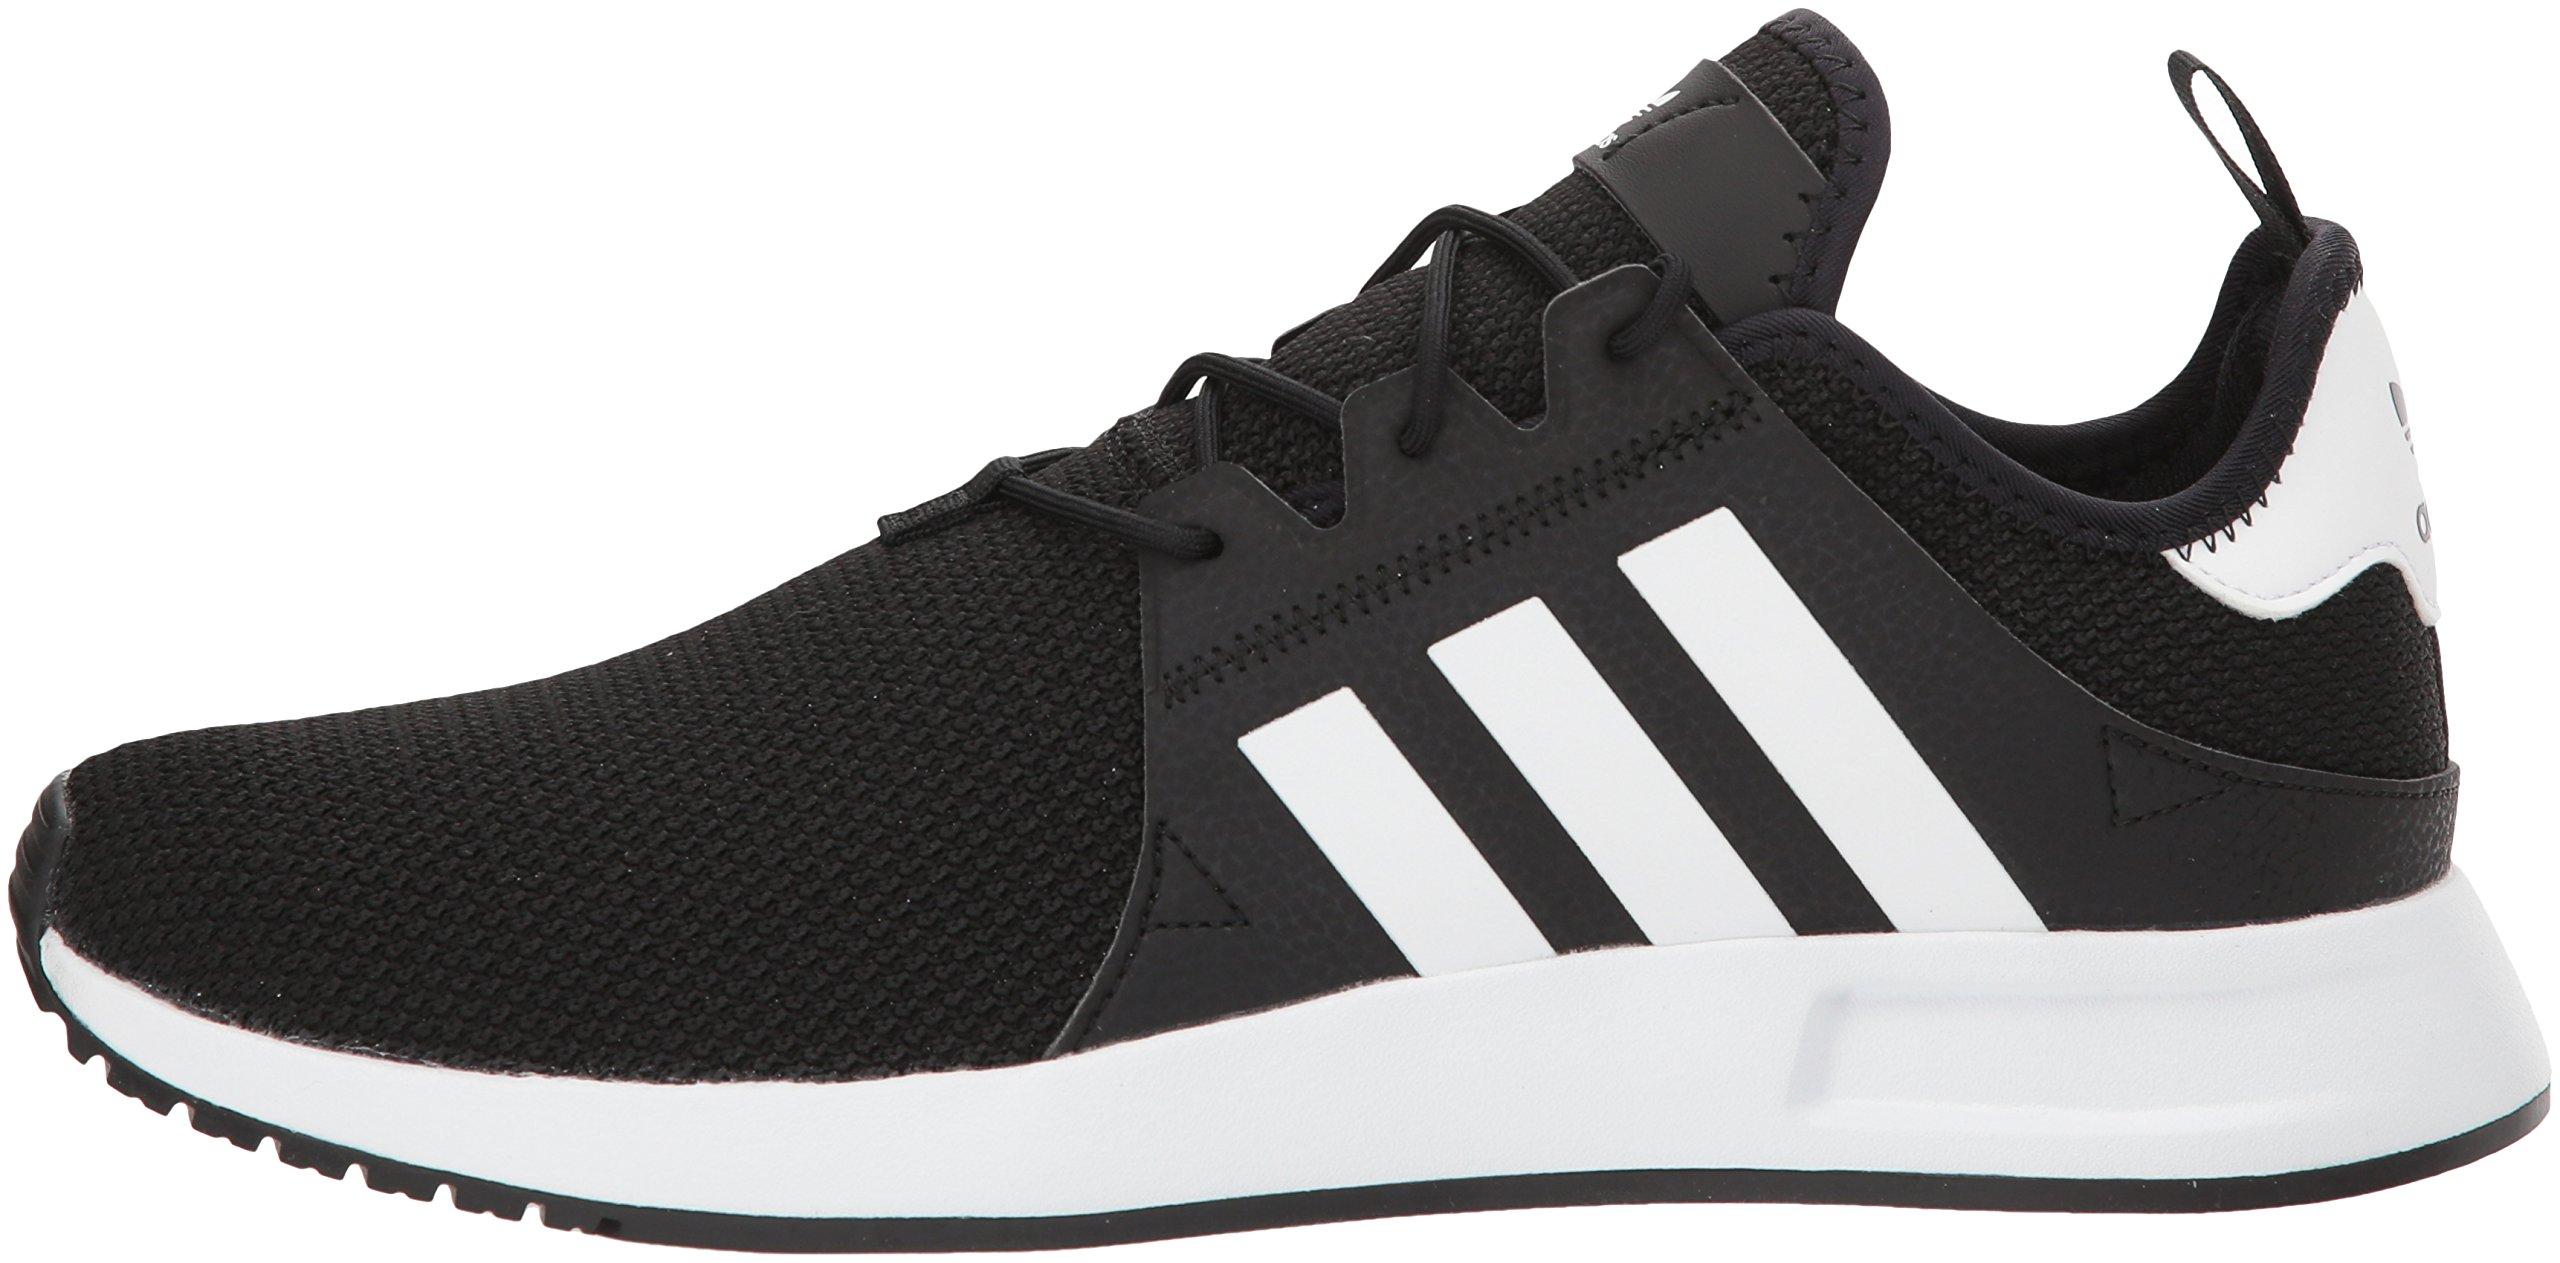 adidas Originals Mens X_PLR Running Shoe White/Black, 5 M US by adidas Originals (Image #5)